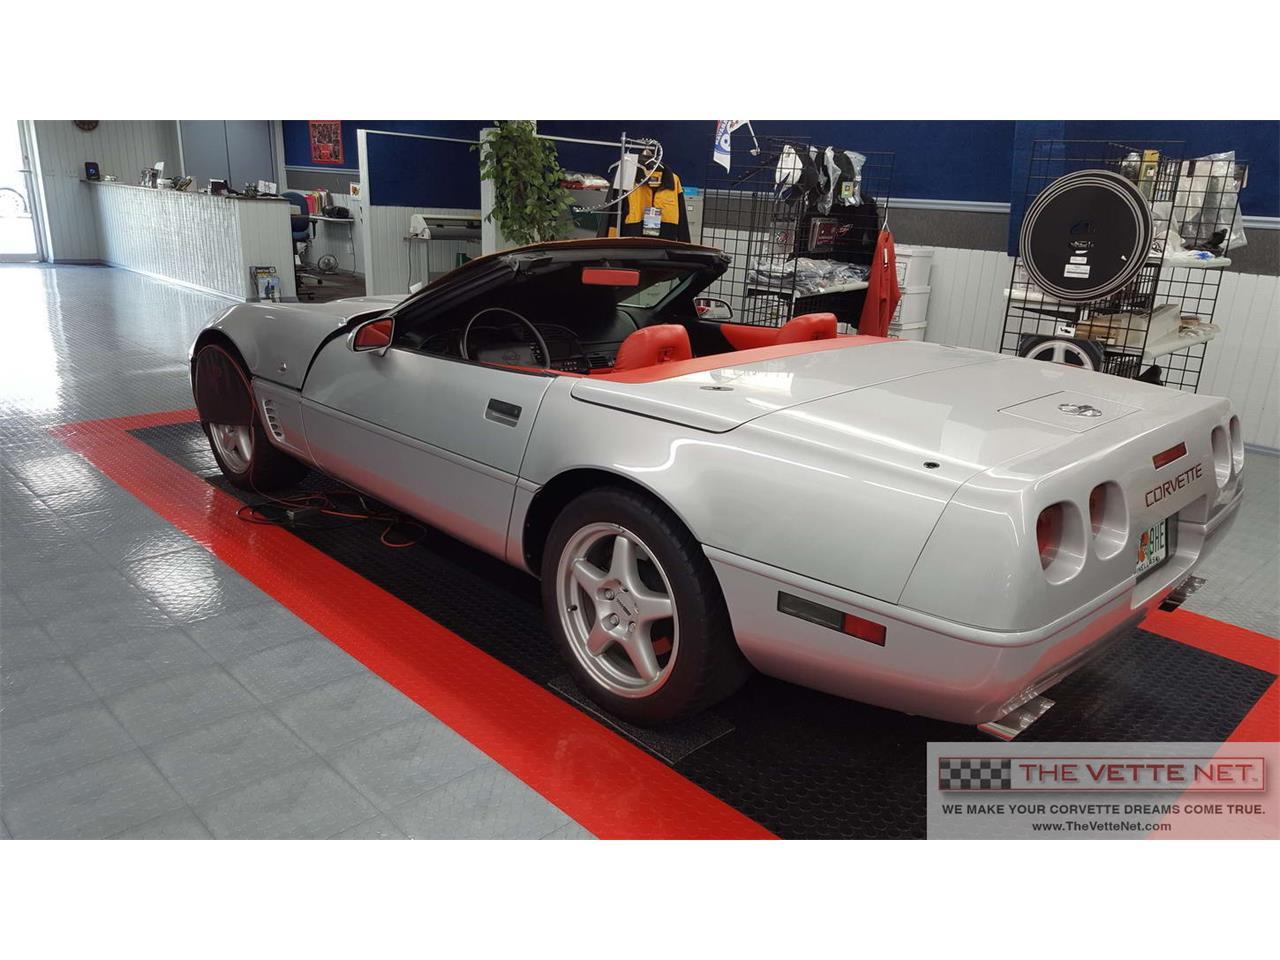 Large Picture of 1996 Chevrolet Corvette - $32,990.00 Offered by The Vette Net - J92K